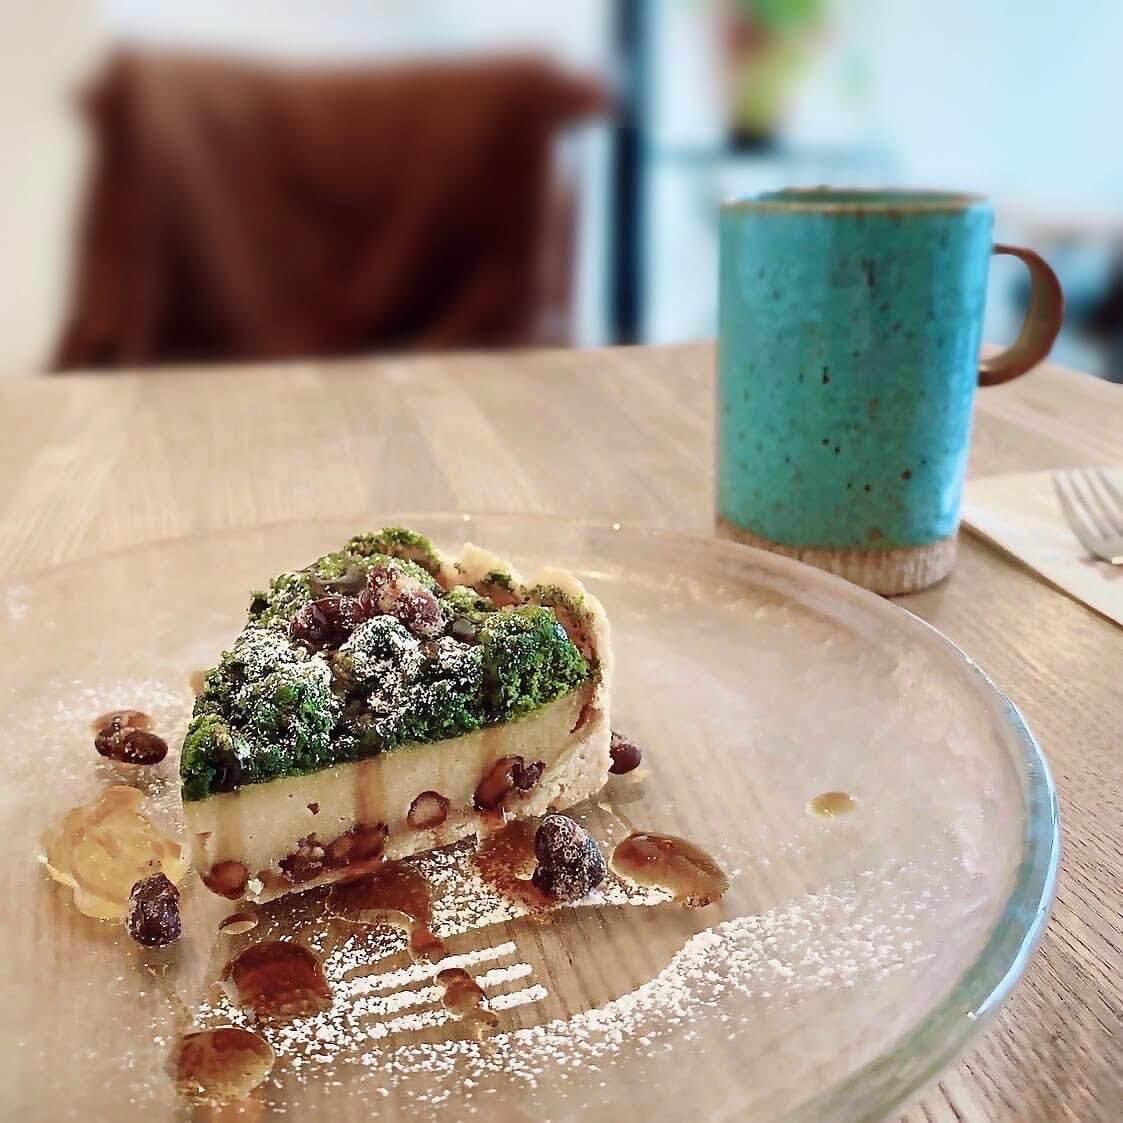 LONERS' CAFE(ロナーズカフェ)の抹茶と黒糖のチーズタルト&ハウスブレンドコーヒー